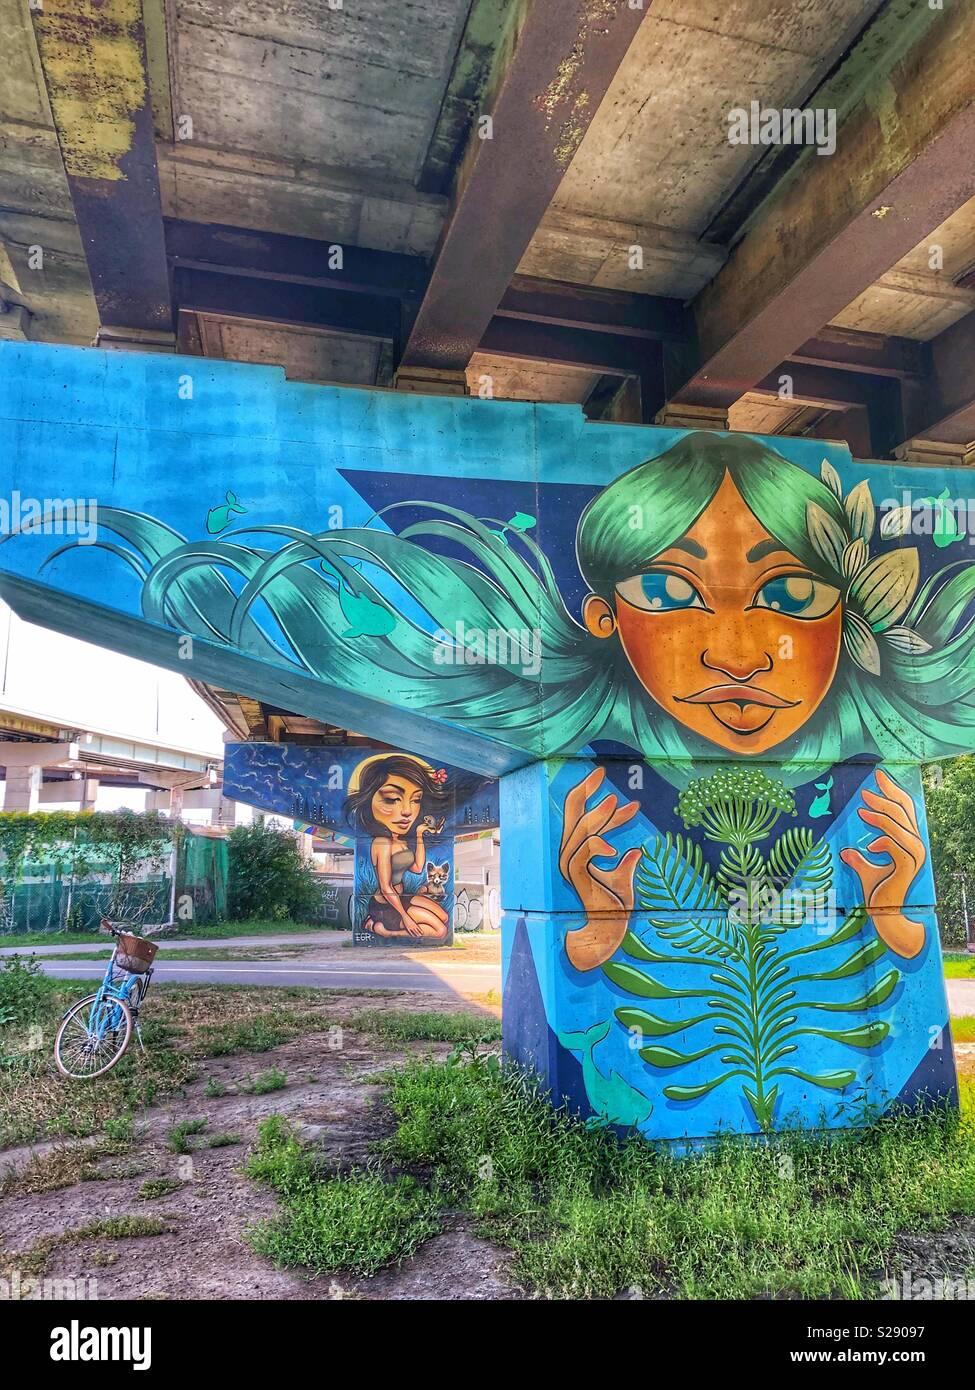 Nature-inspired street art. - Stock Image